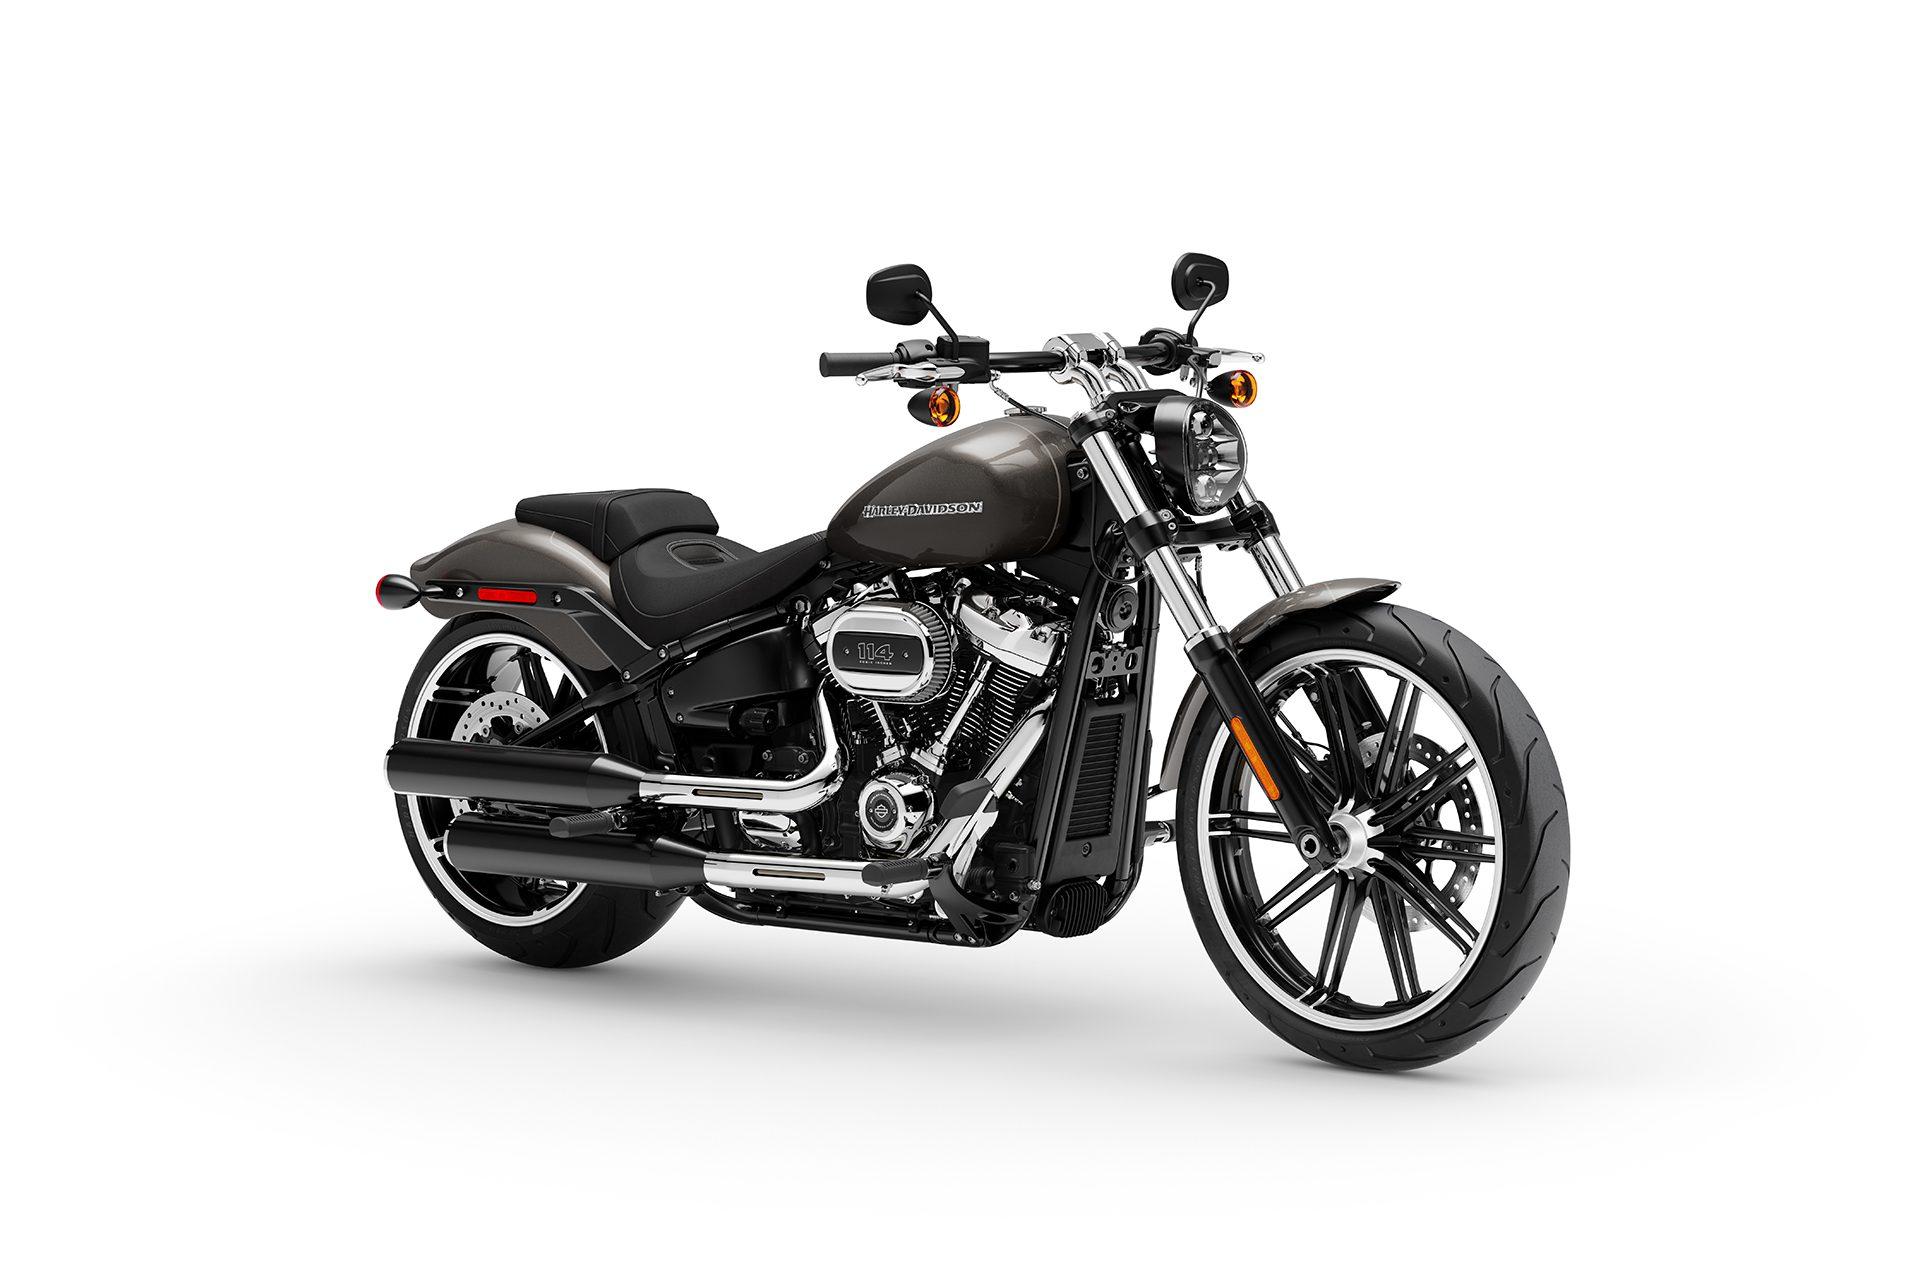 Harley-Davidson Breakout FXBR/S 2019 Neufahrzeug kaufen bei Thunderbike